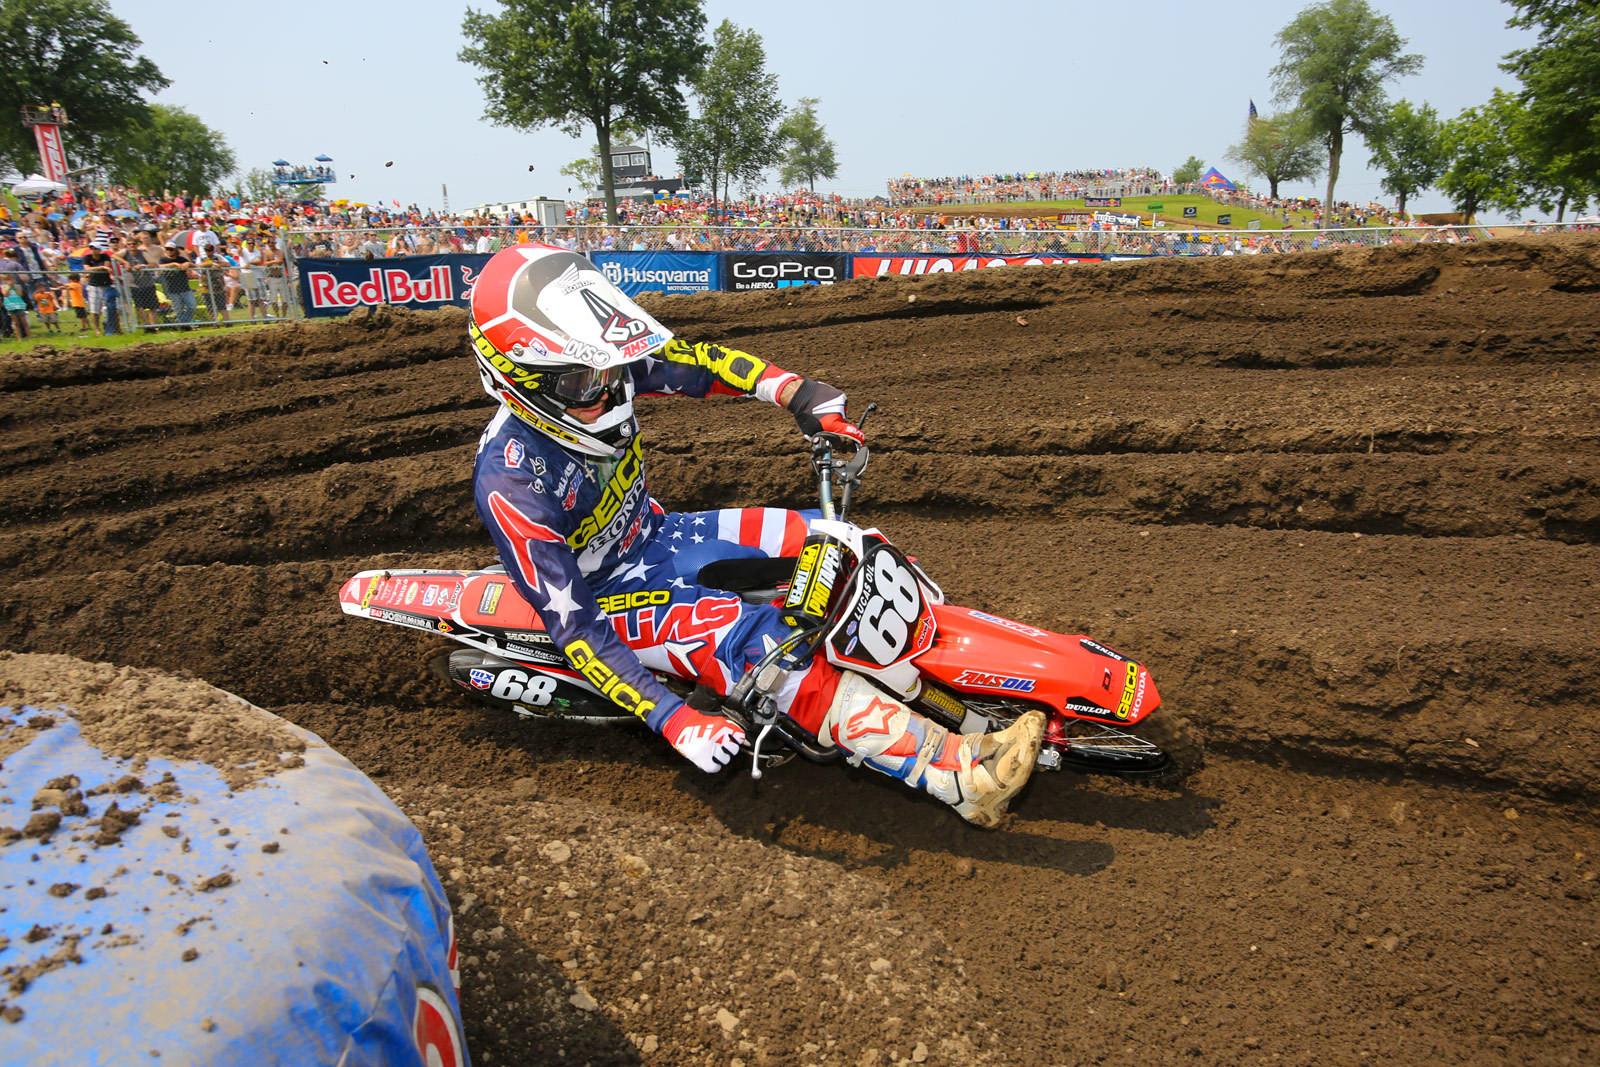 Christian Craig - Photo Blast: RedBud - Motocross Pictures - Vital MX